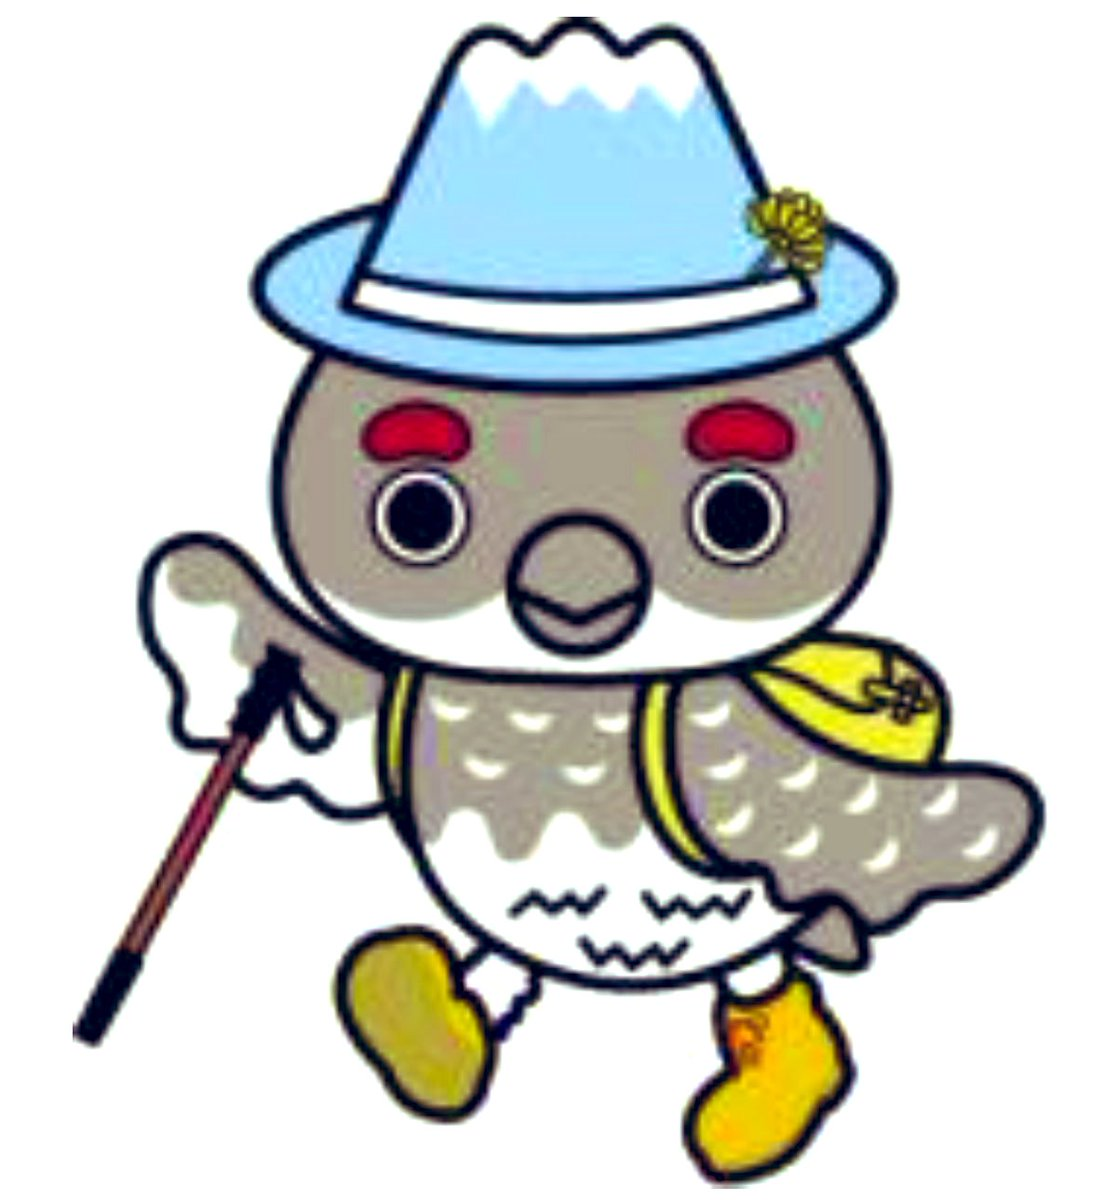 Raijii, a 20,005-year-old rock ptarmigan bird with a mountain hat, is the mascot of Tateyama town in Japan.